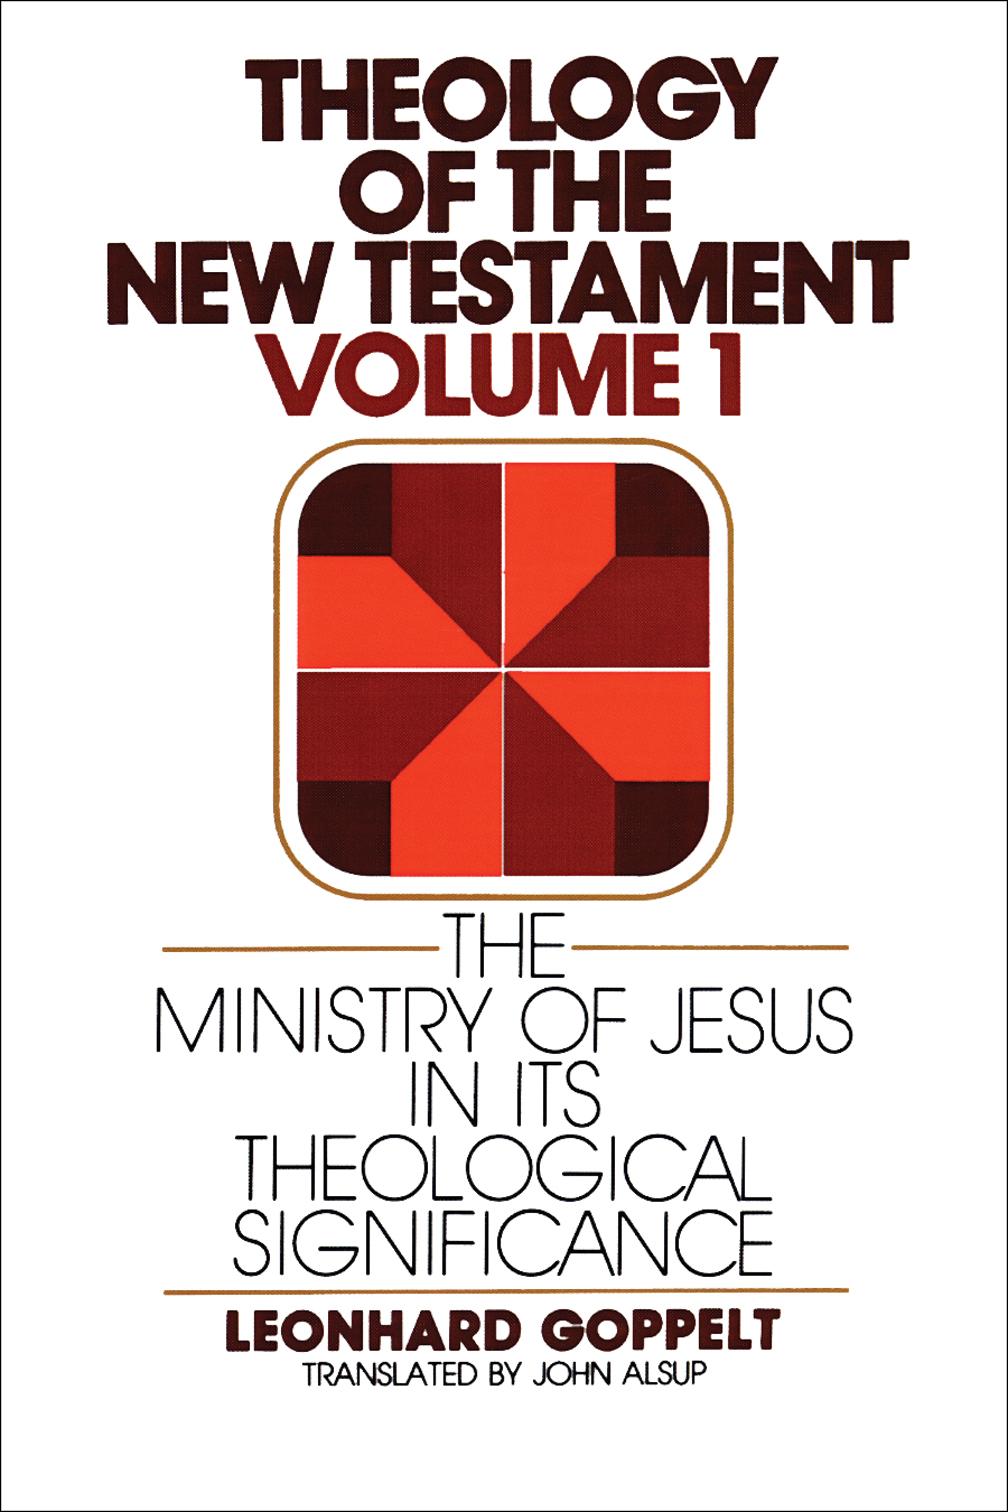 Theology of the new testament volume 1 leonhard goppelt eerdmans share fandeluxe Gallery